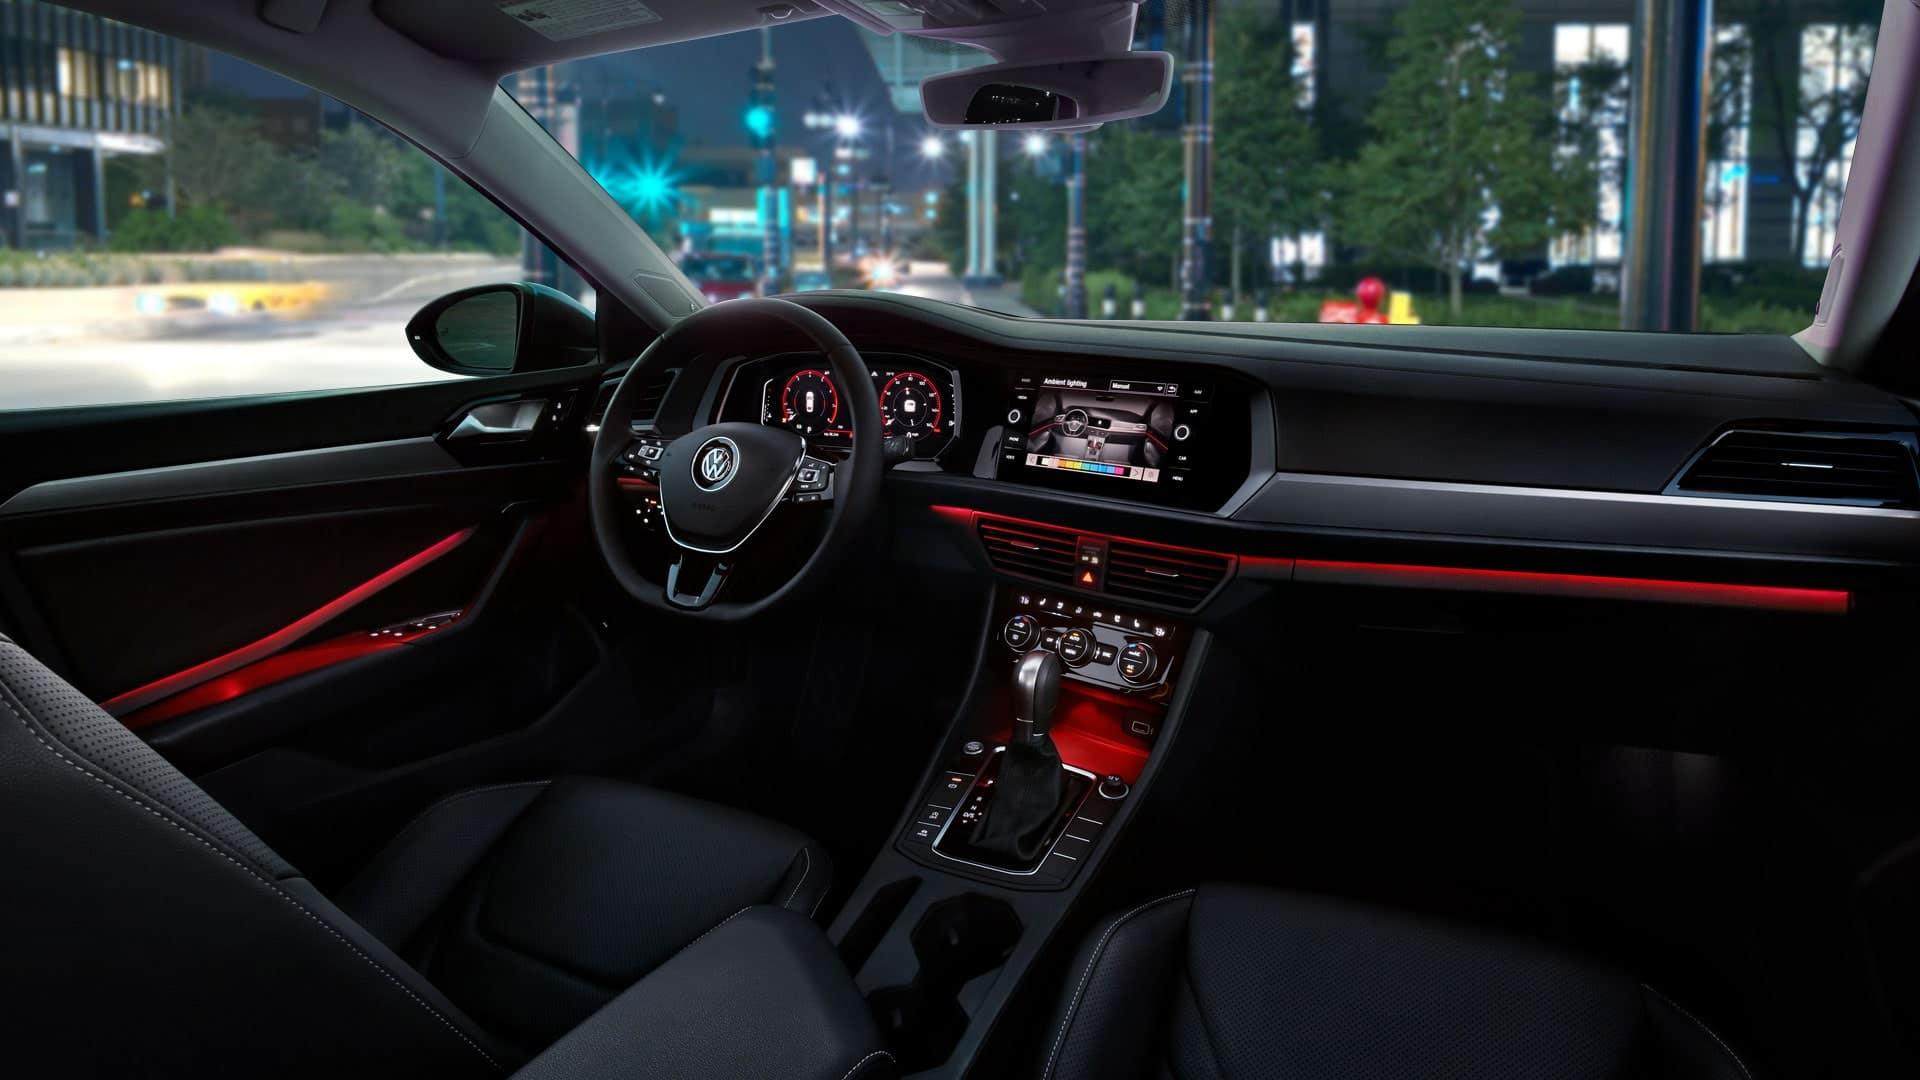 Ambient lighting inside the VW Jetta